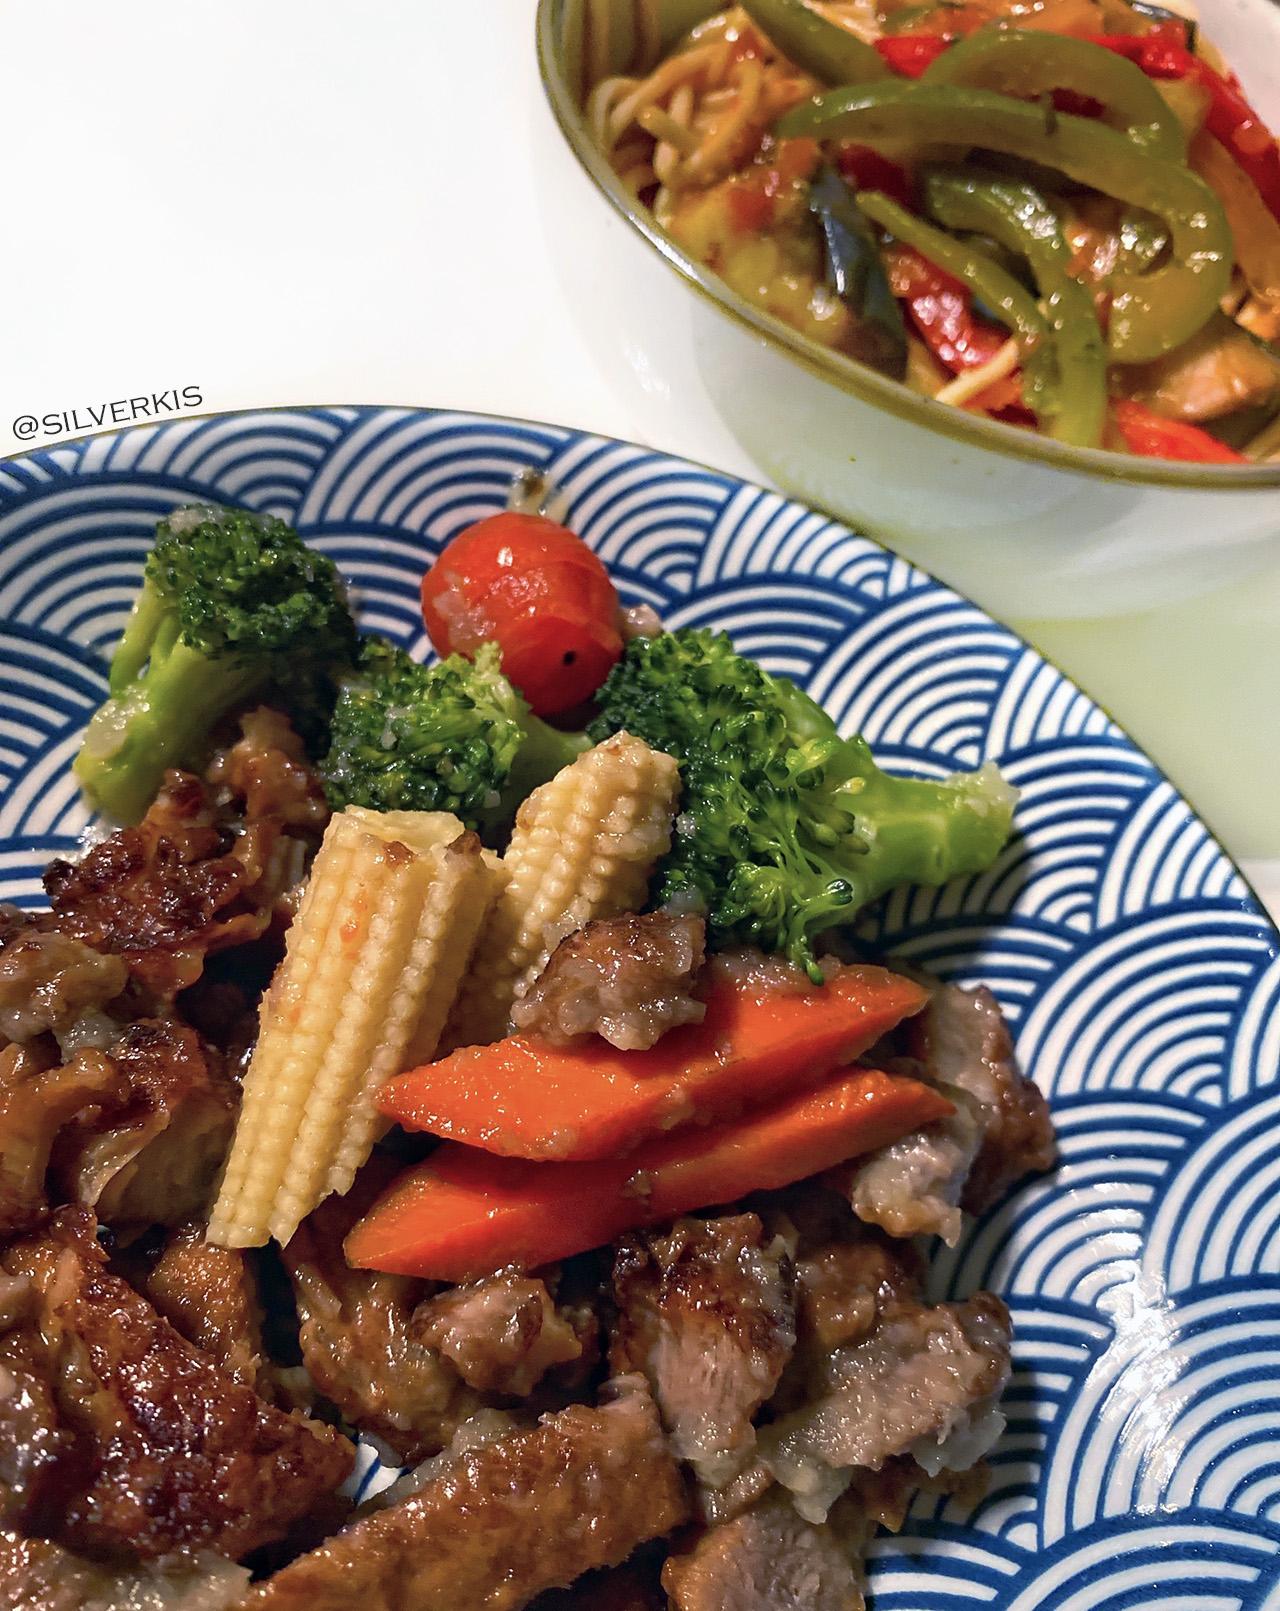 Tian Wei Signature fusion meal